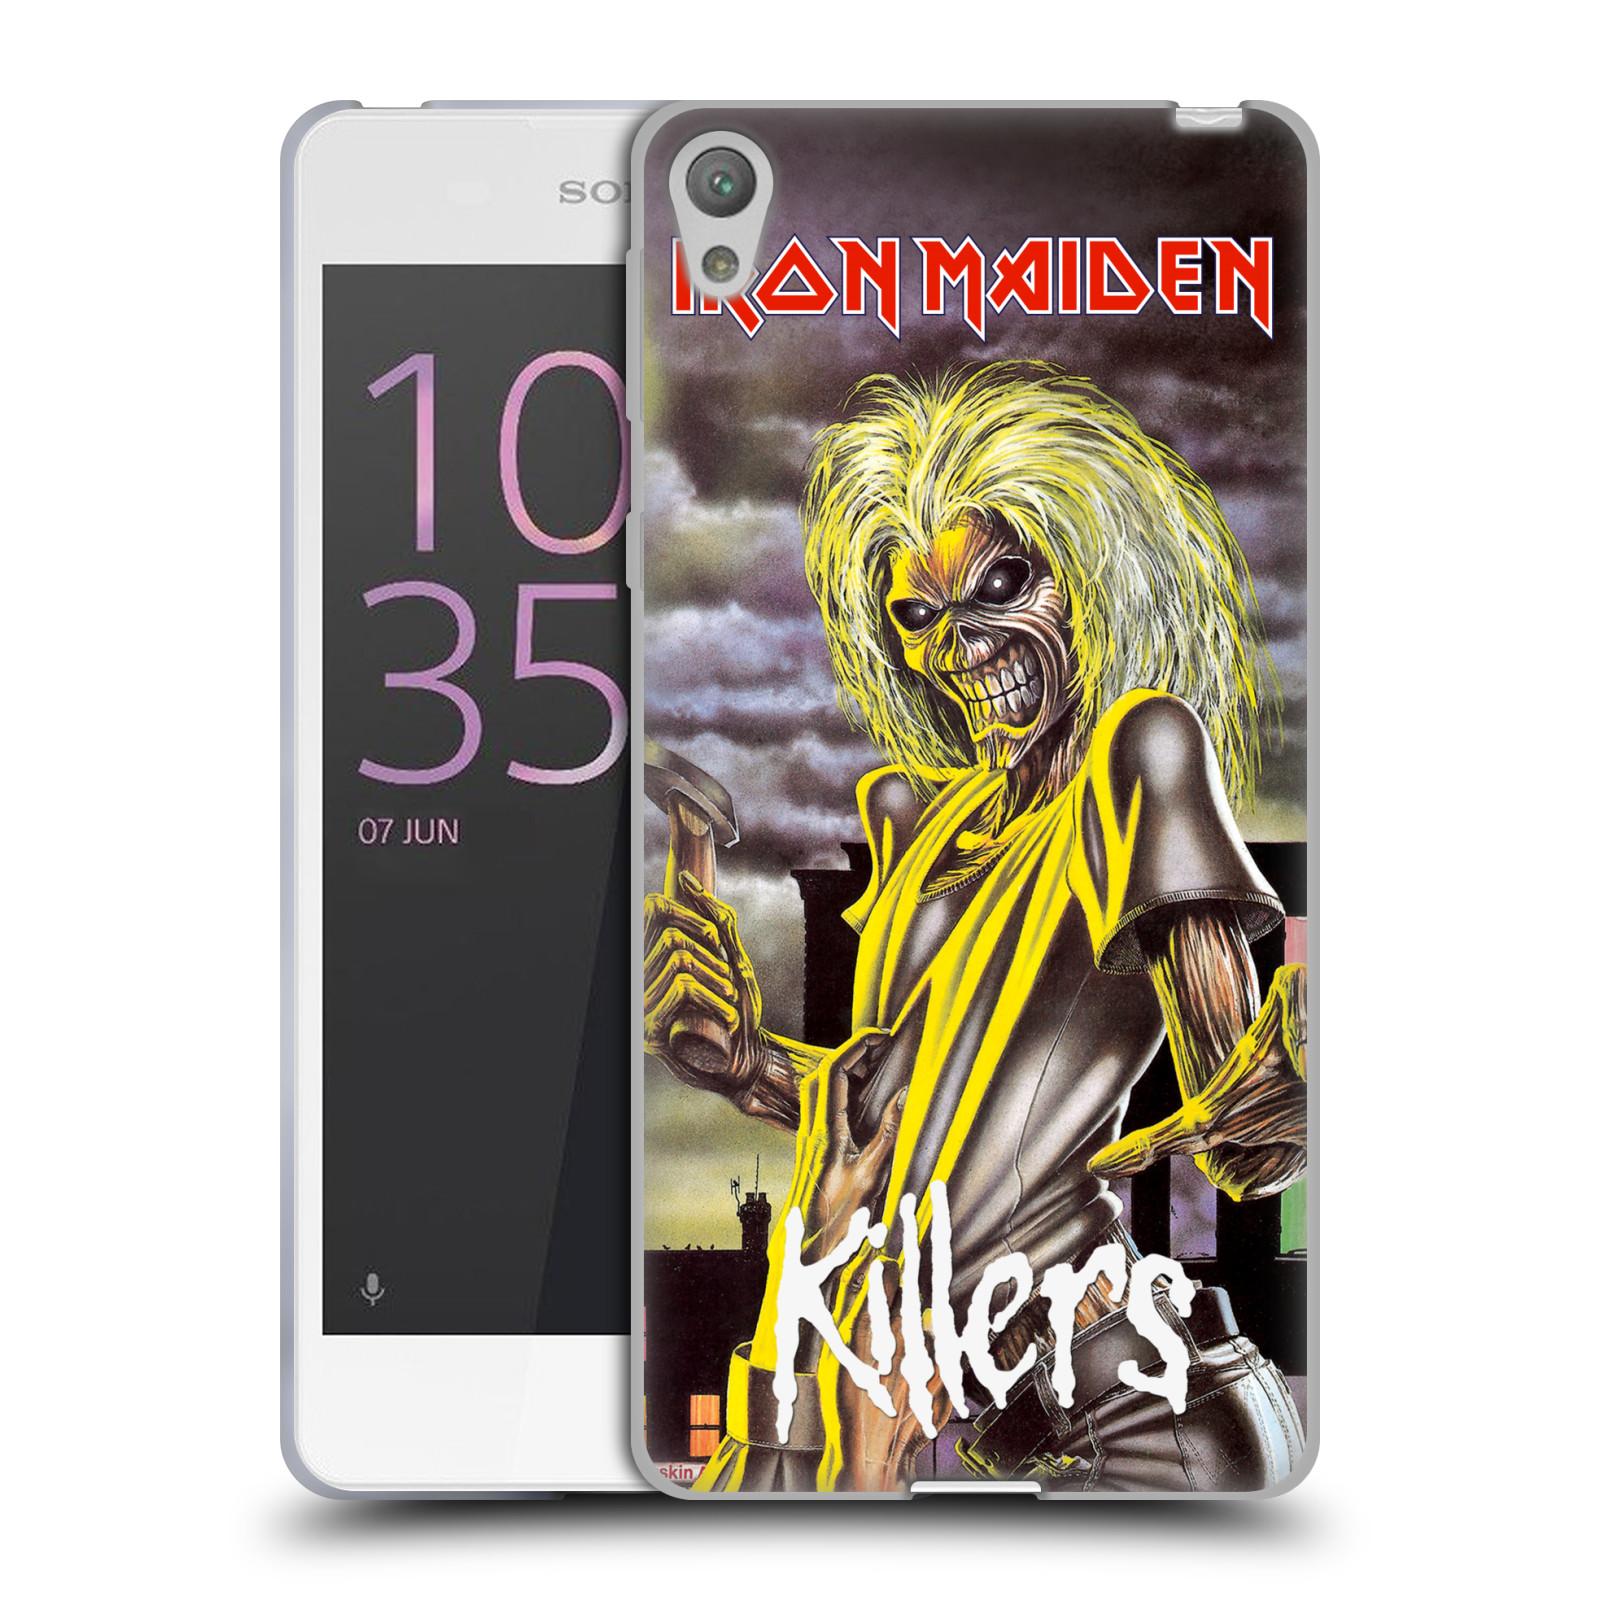 Silikonové pouzdro na mobil Sony Xperia E5 HEAD CASE - Iron Maiden - Killers (Silikonový kryt či obal na mobilní telefon s licencovaným motivem Iron Maiden Sony Xperia E5 F3311)